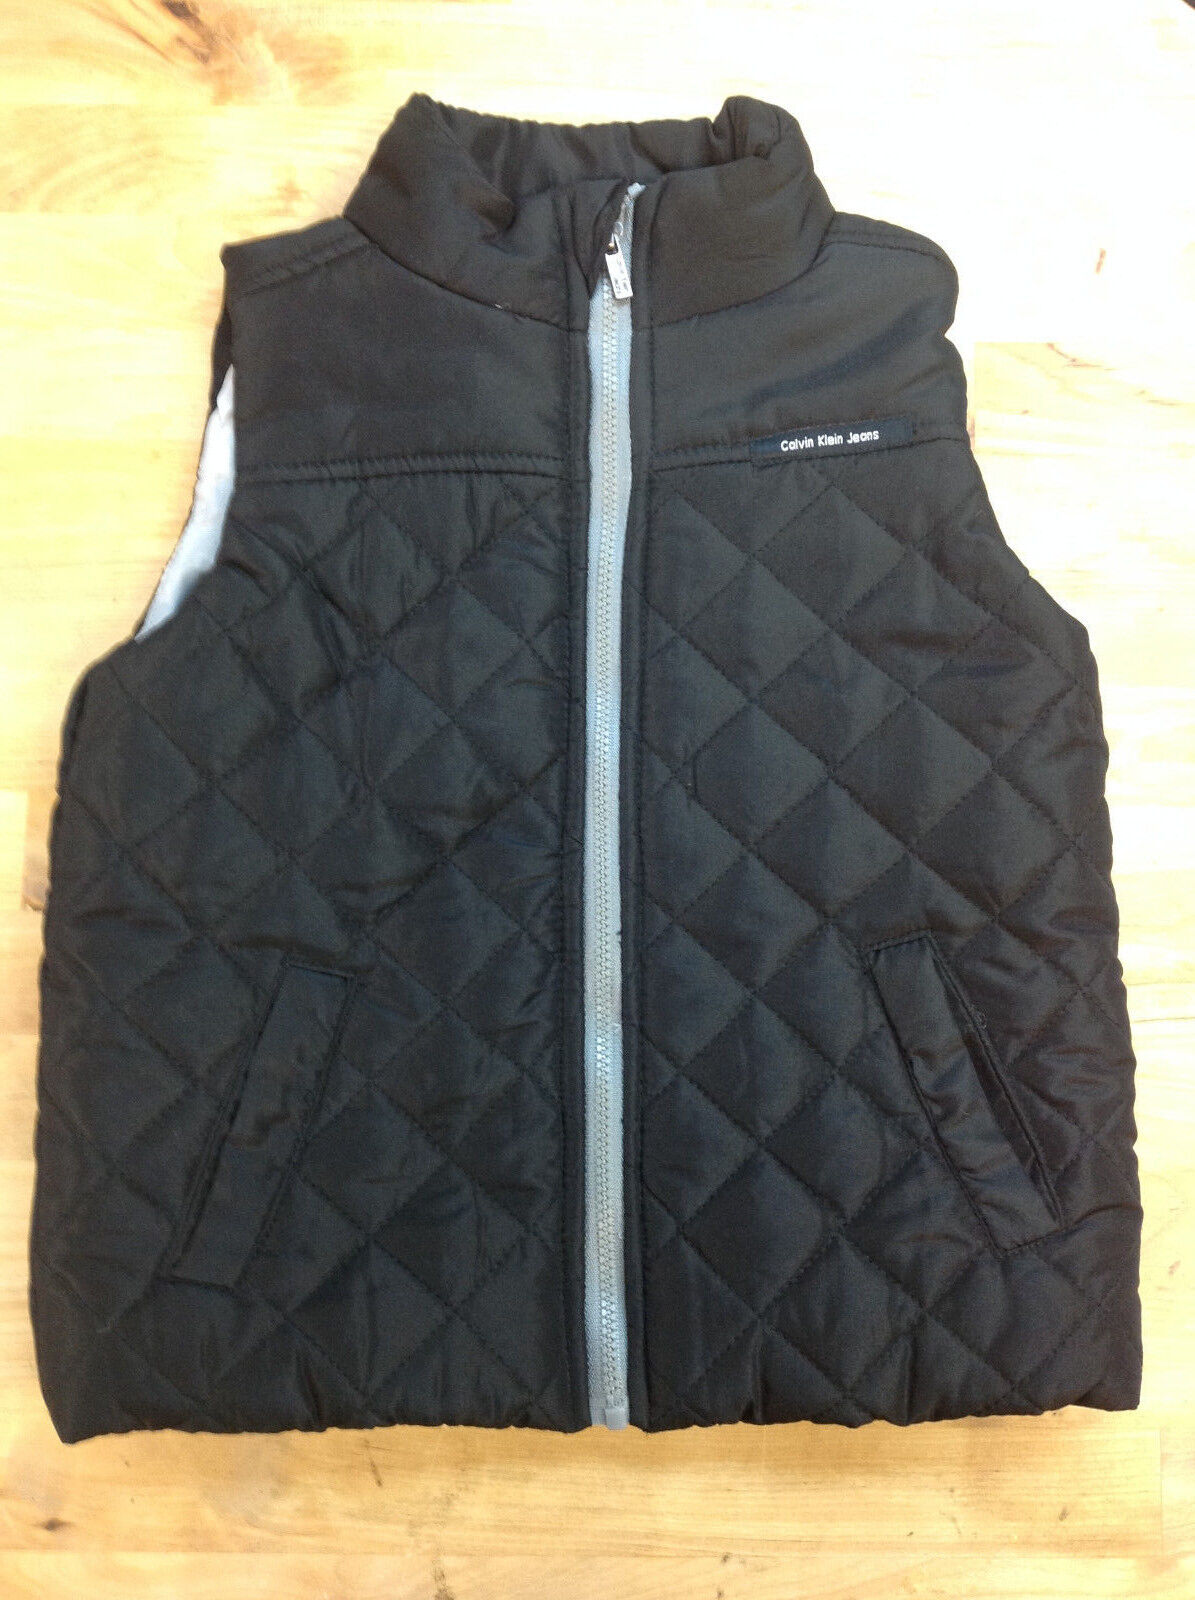 Calvin Klein Jeans Unisex Toddler's Vest, Black, Size 2T